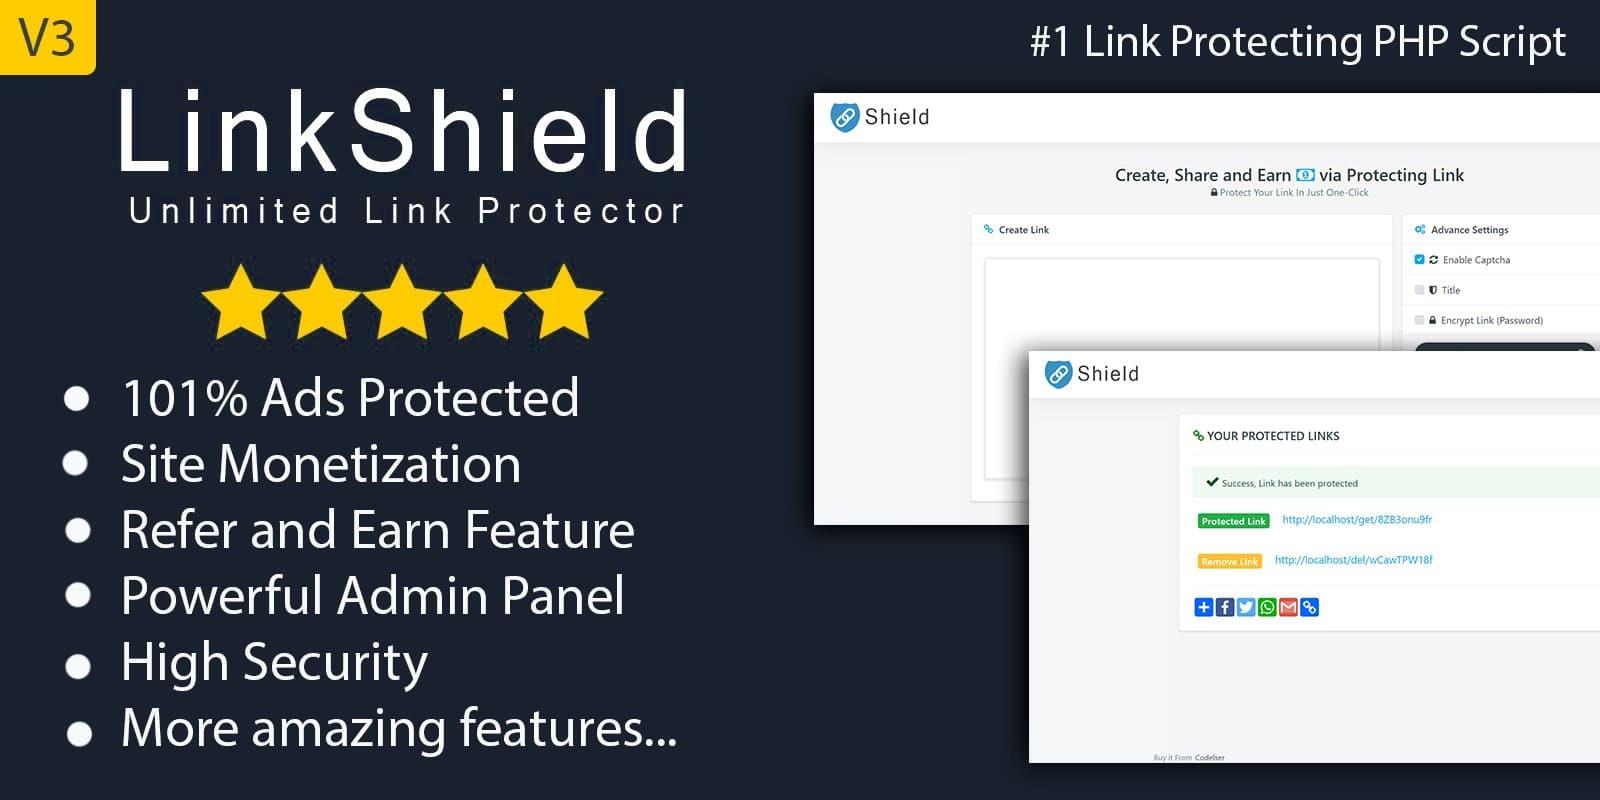 LinkShield - link protection script